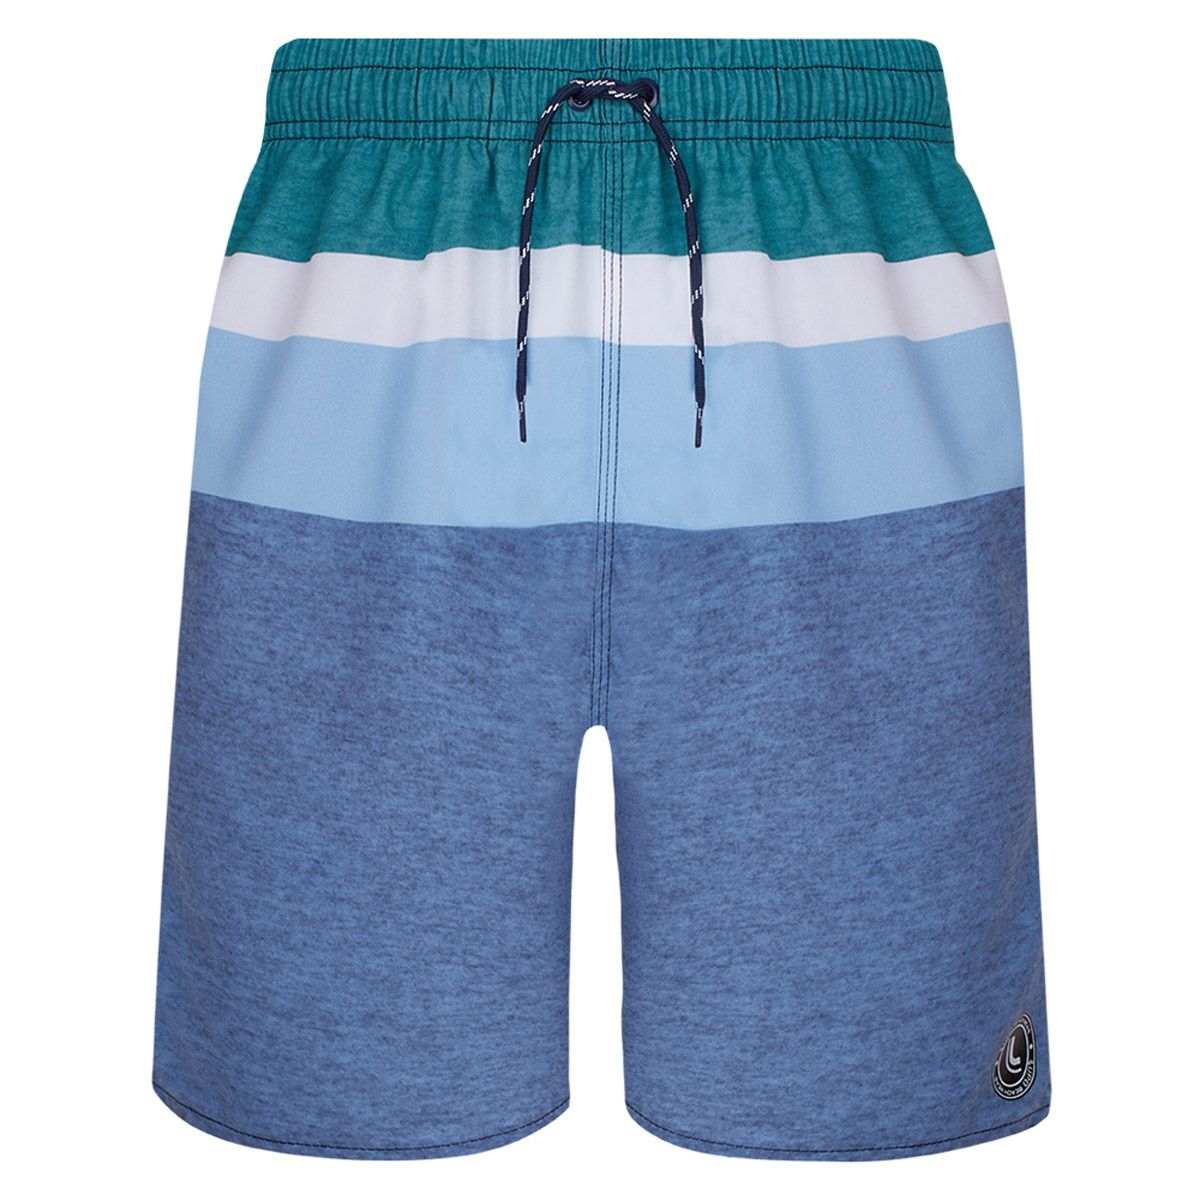 Short de praia Lupo Beachwear Listrado 29001-001